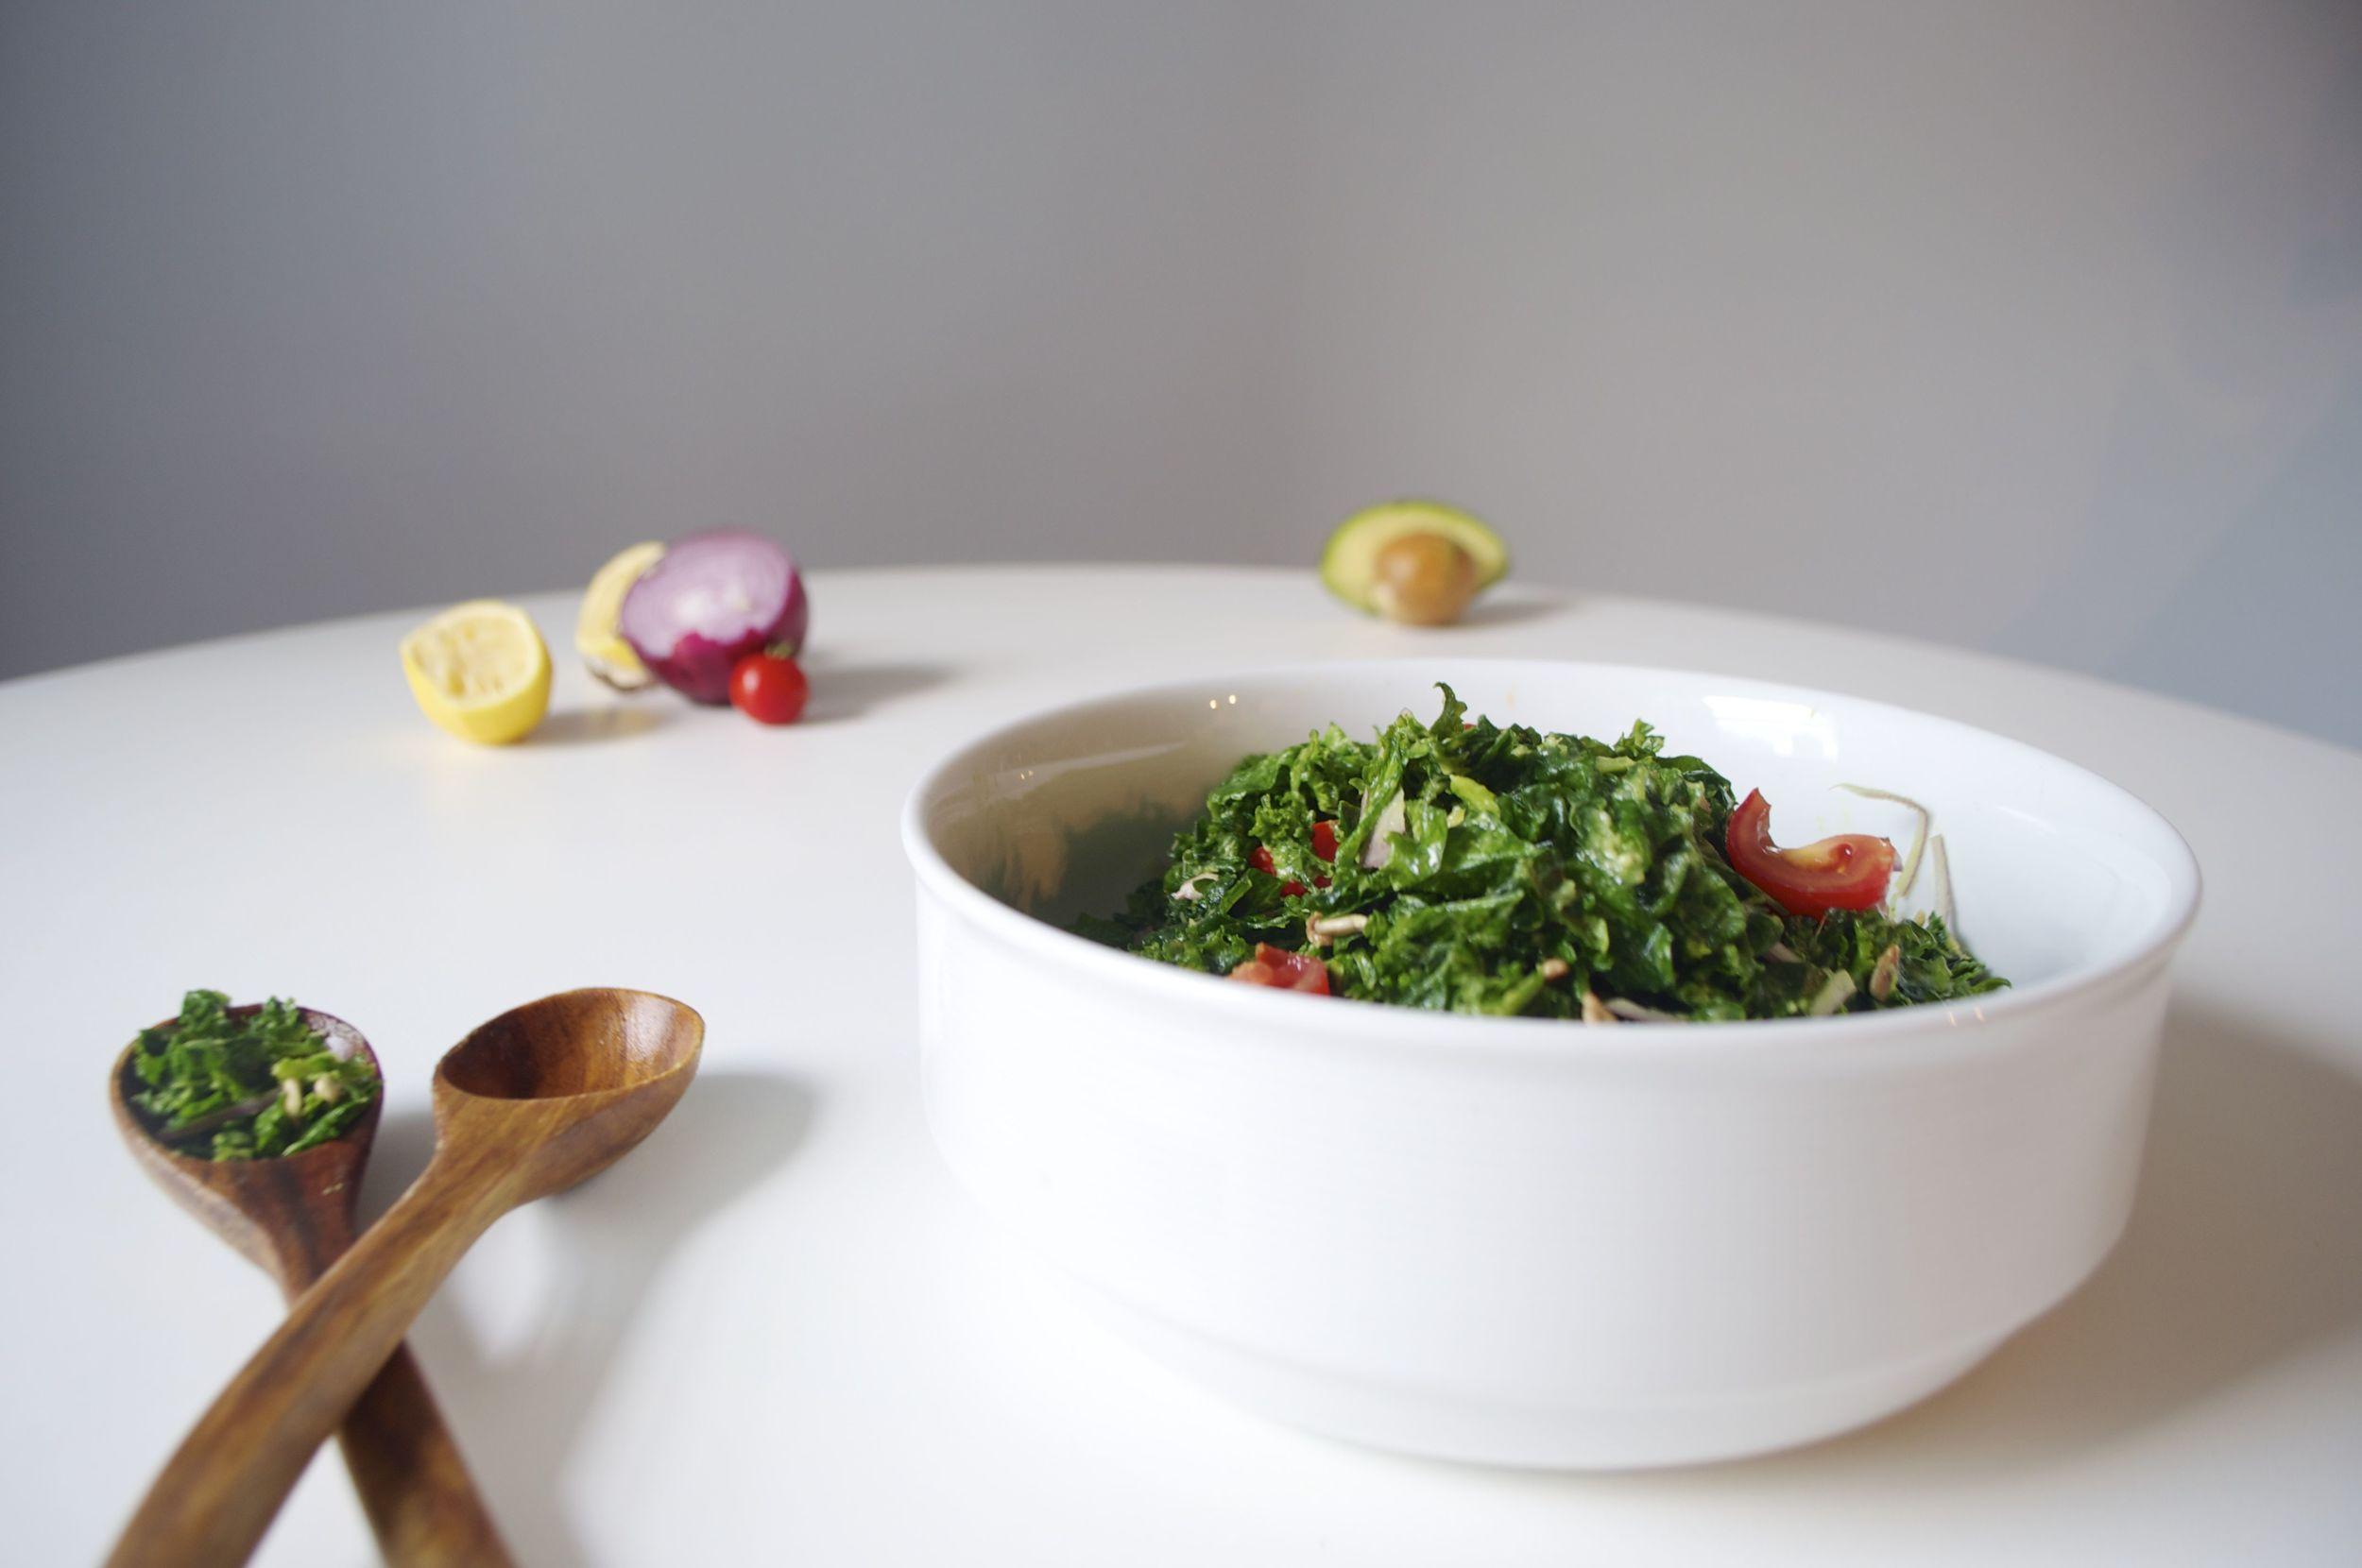 detox-kale-avocado-salad-fried-parsley-copyright